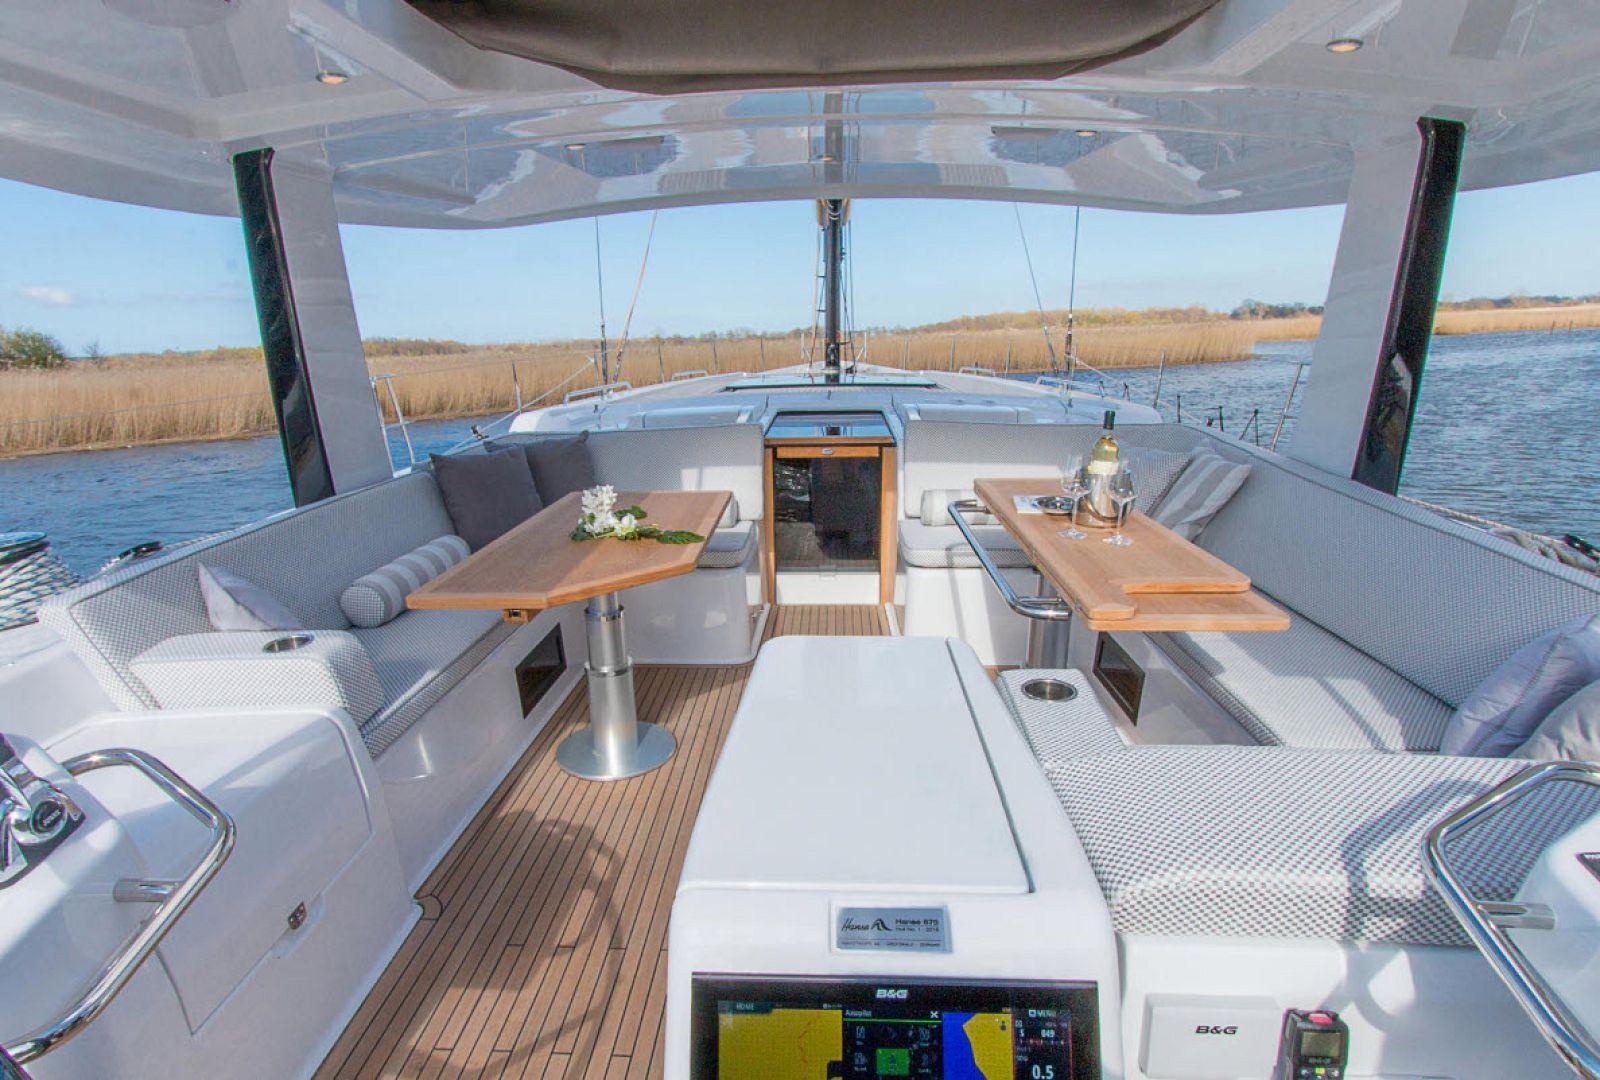 Main deck living on the Hanse